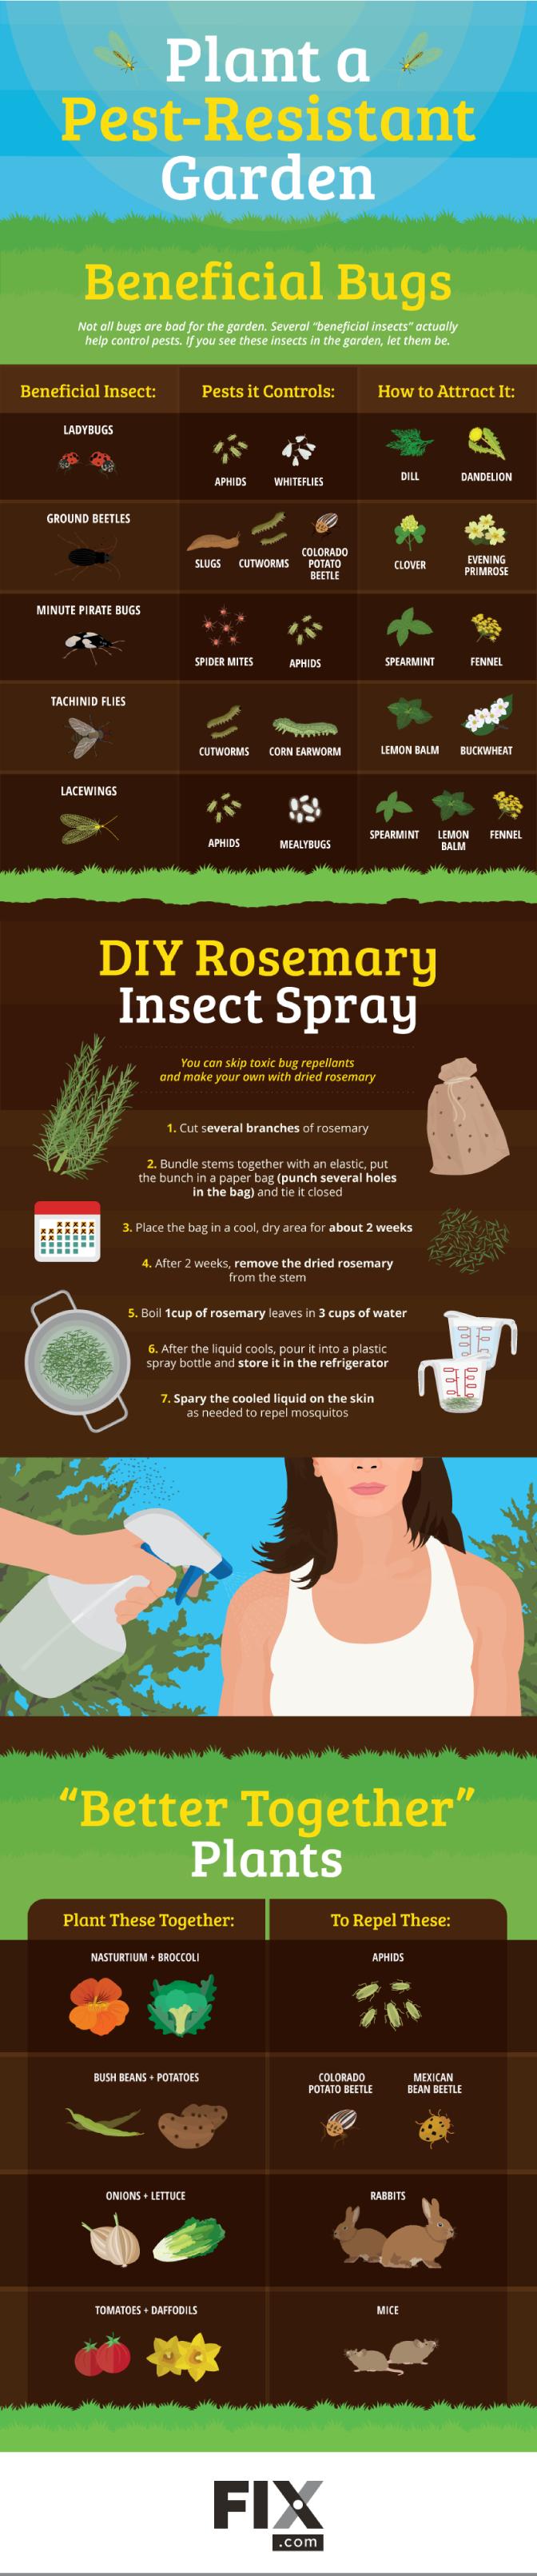 Plant a Pest-Resistant Garden [Infographic] | ecogreenlove